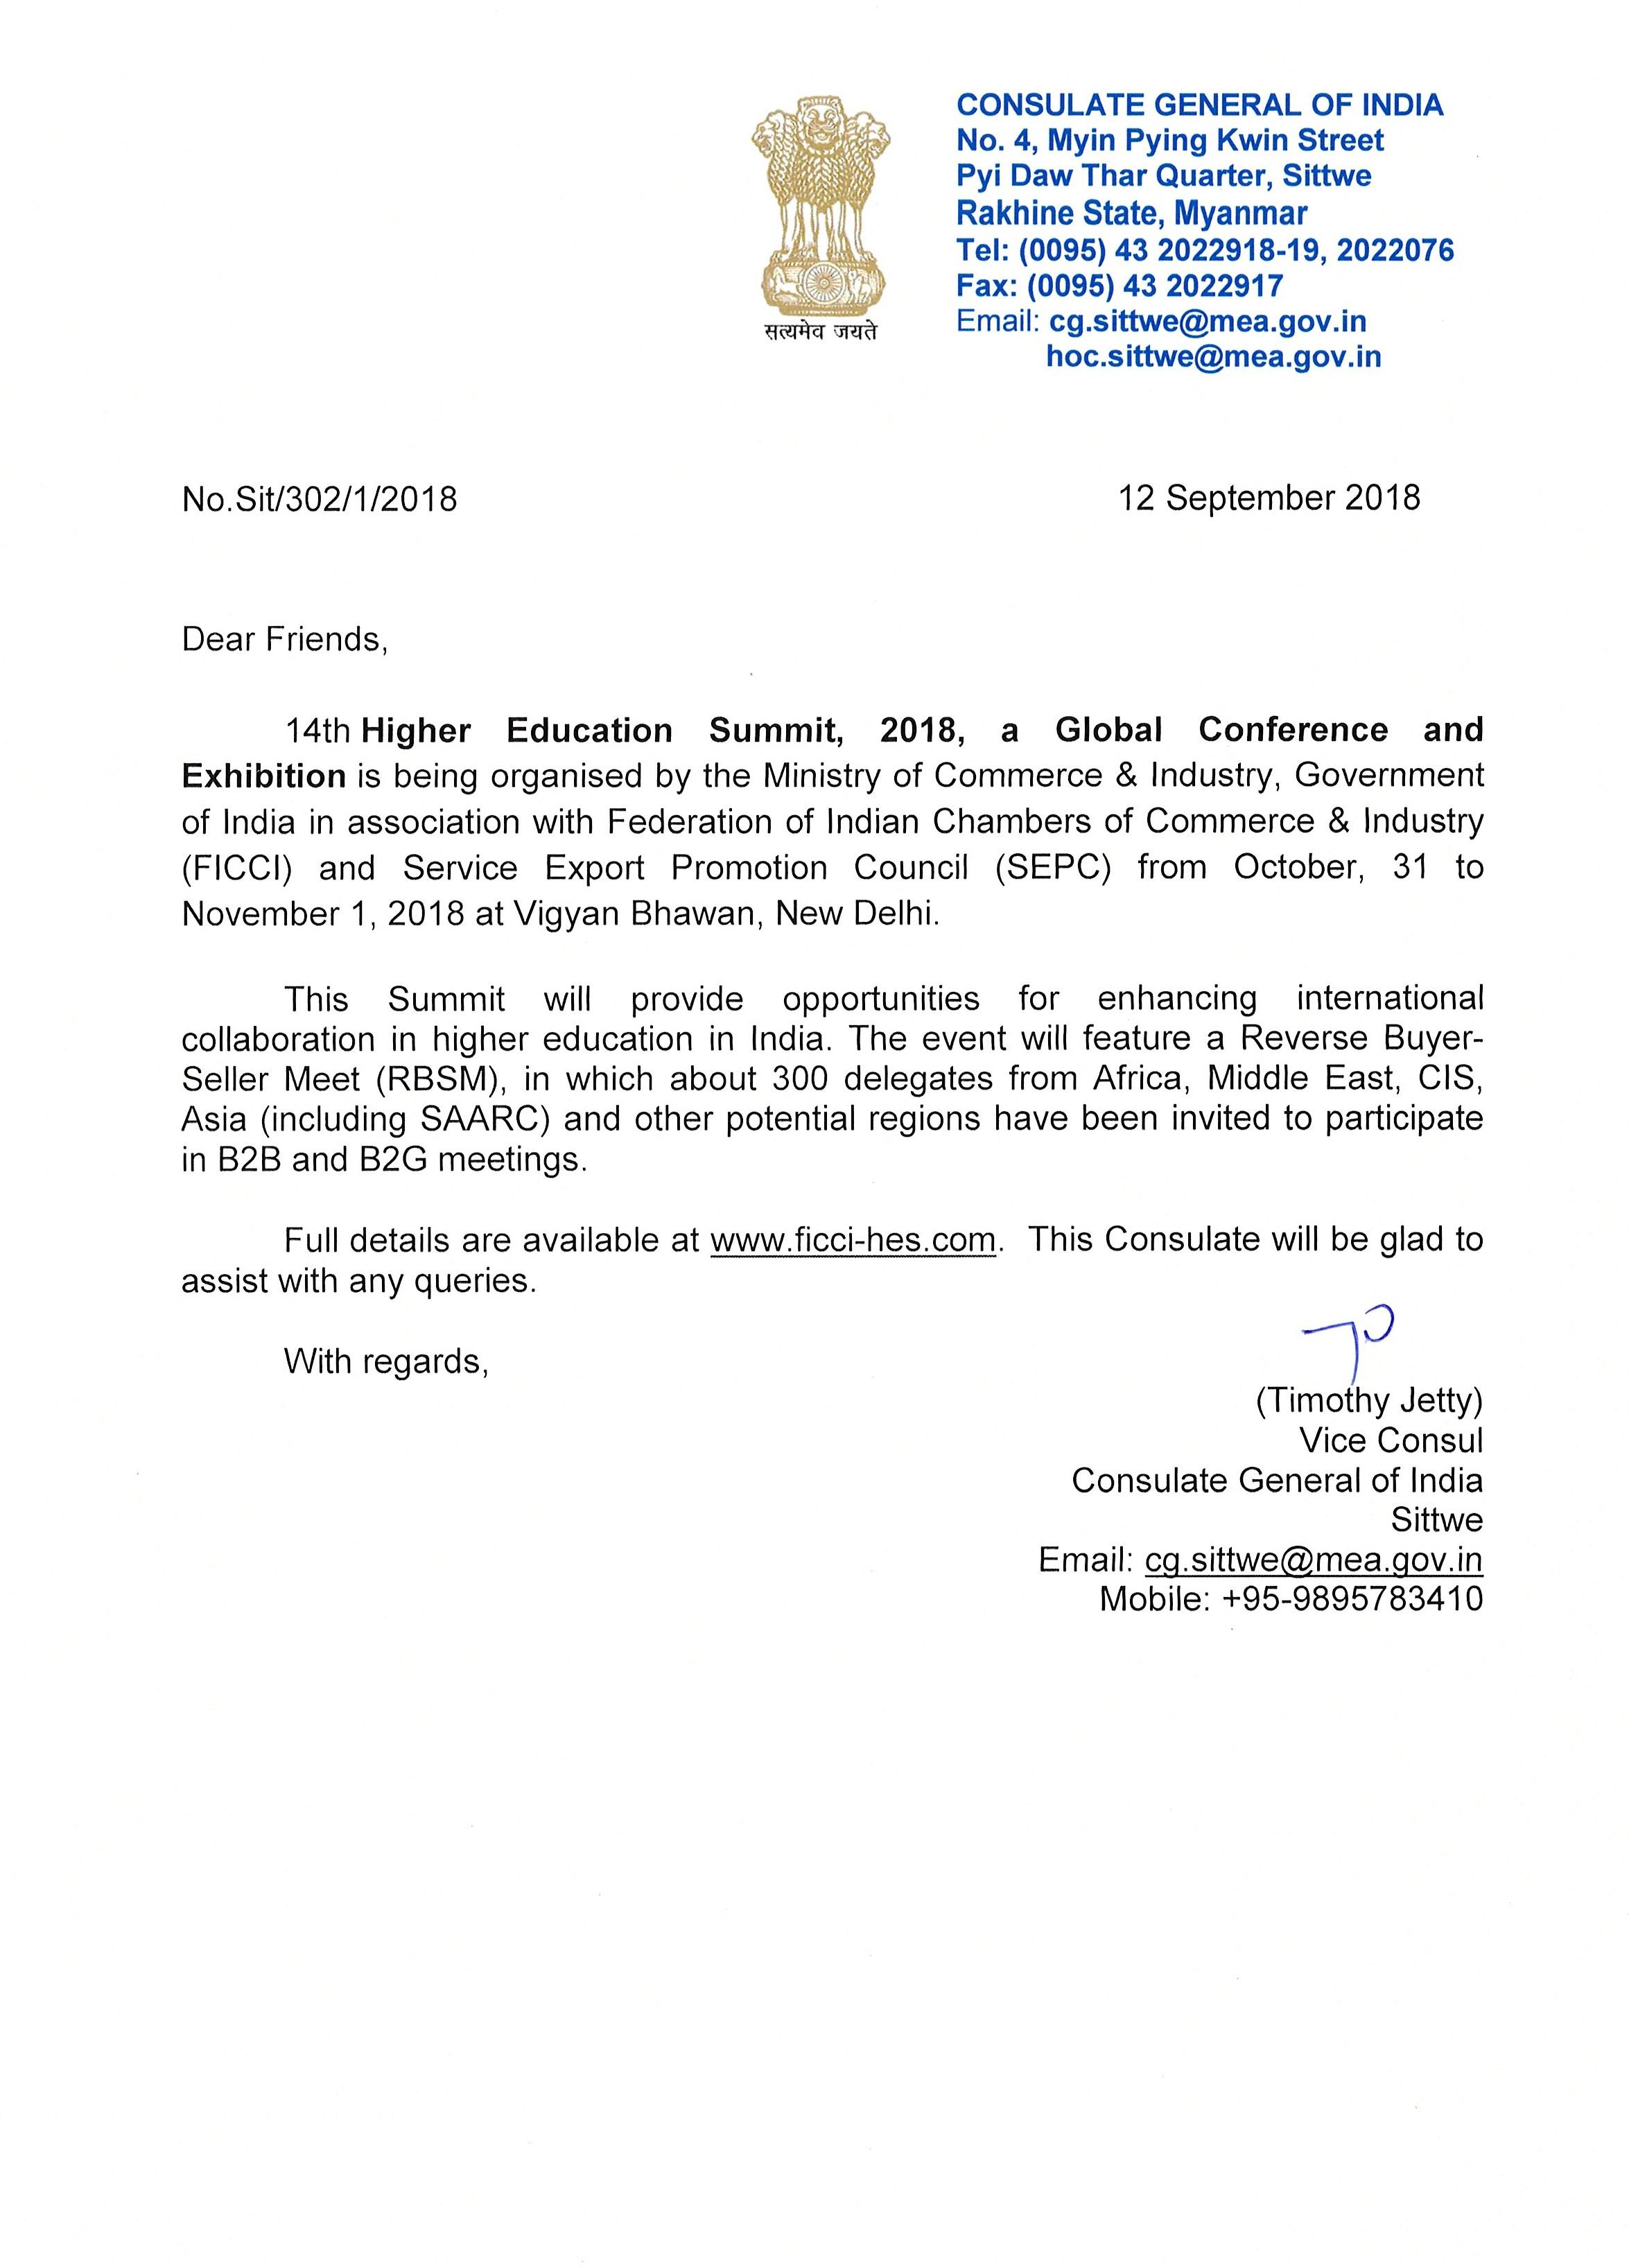 Consulate General of India, Sittwe, Myanmar : Important